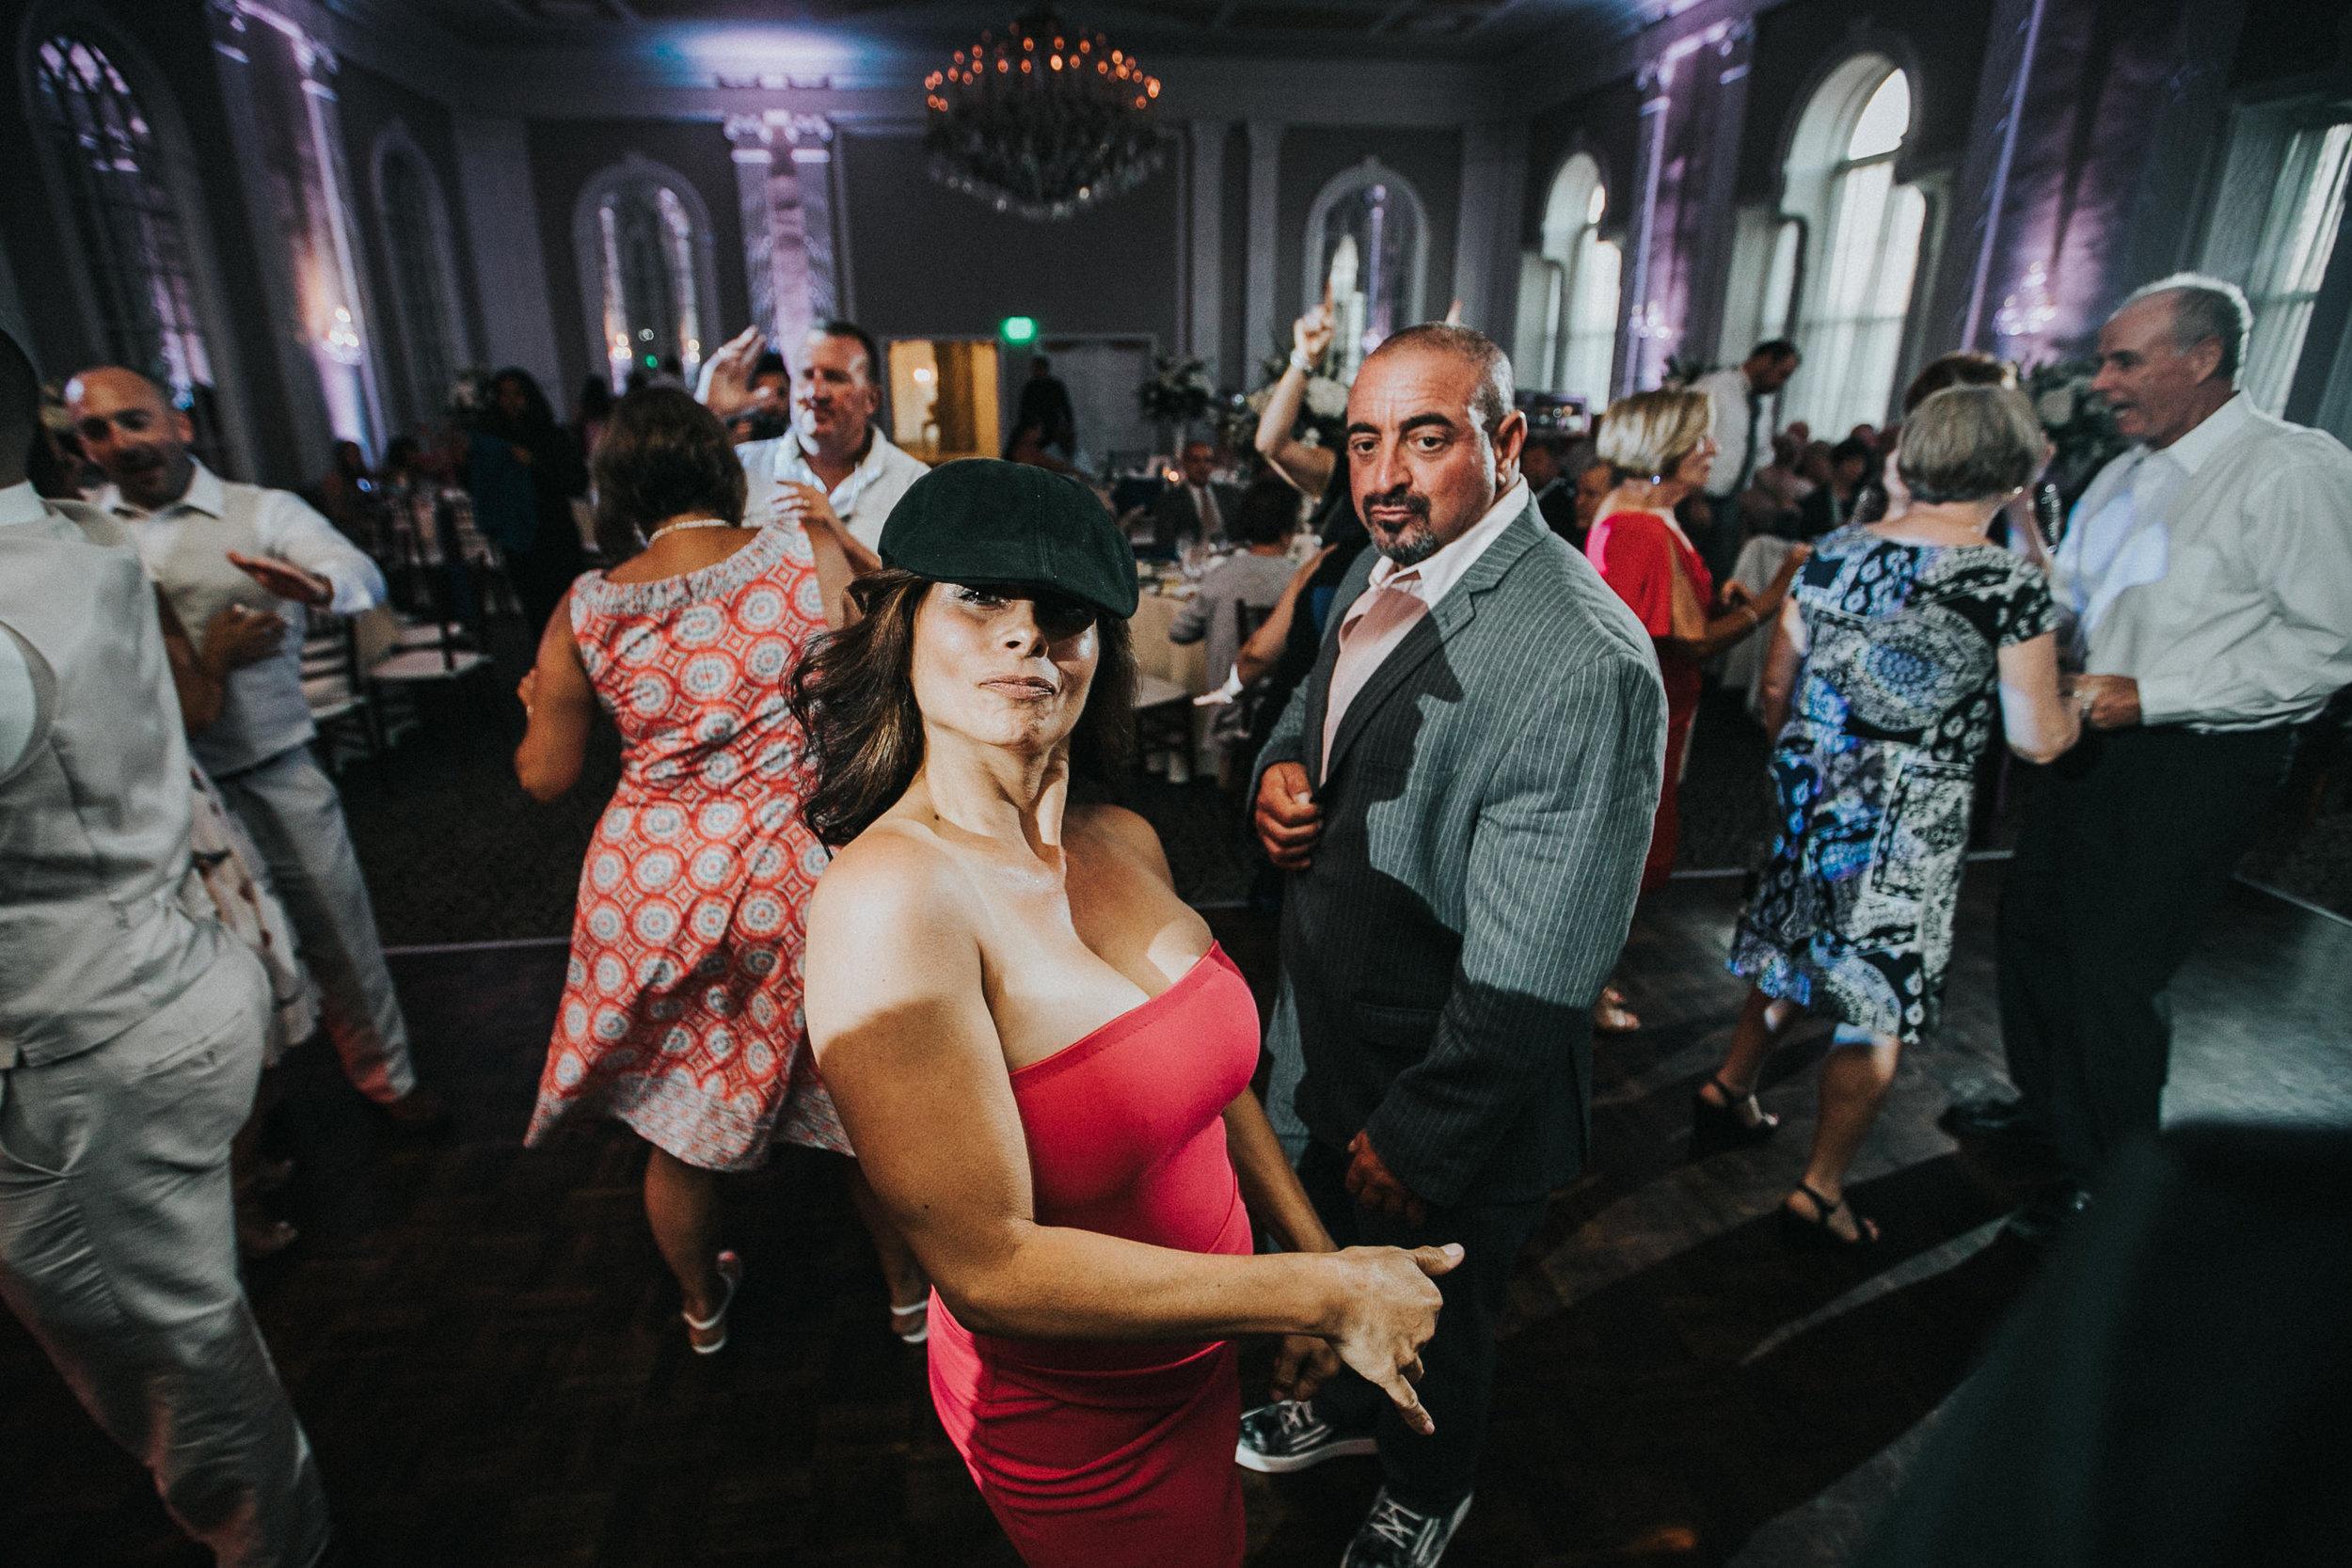 JennaLynnPhotography-NJWeddingPhotographer-Wedding-TheBerkeley-AsburyPark-Allison&Michael-Reception-109.jpg